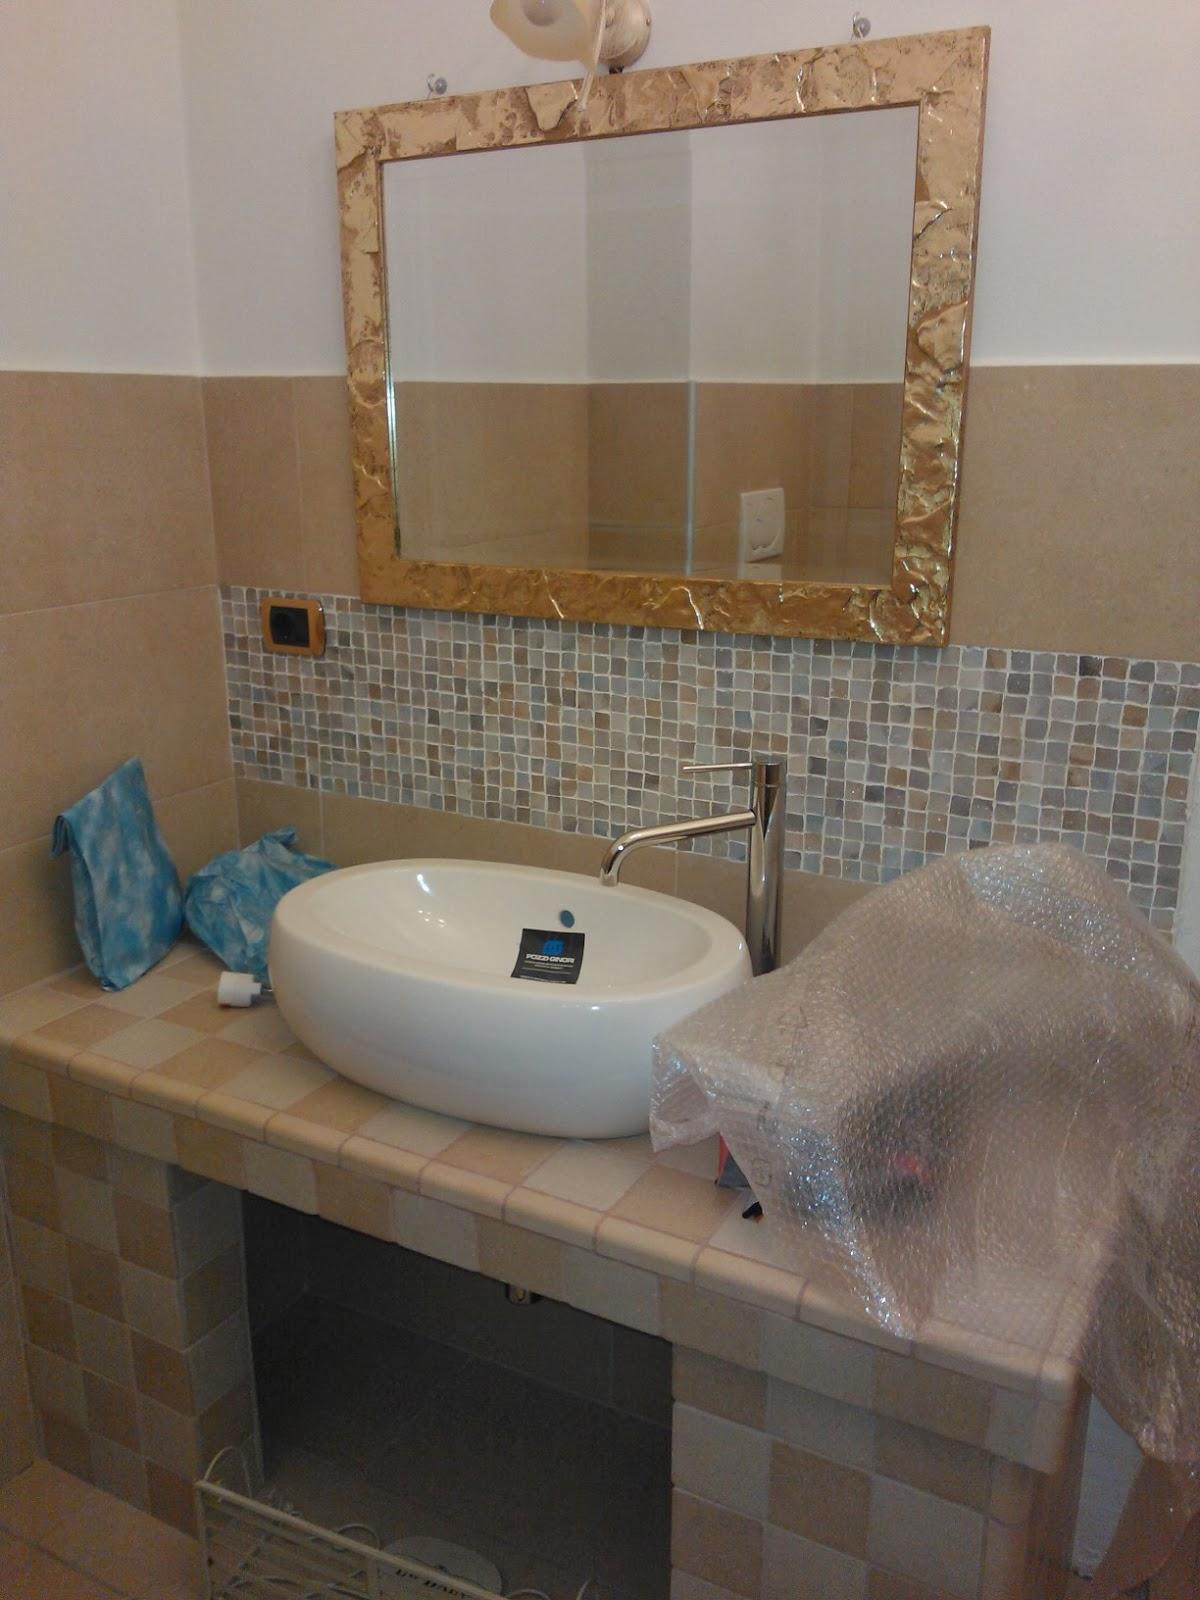 Immagini bagni in muratura for Arredo bagno in muratura